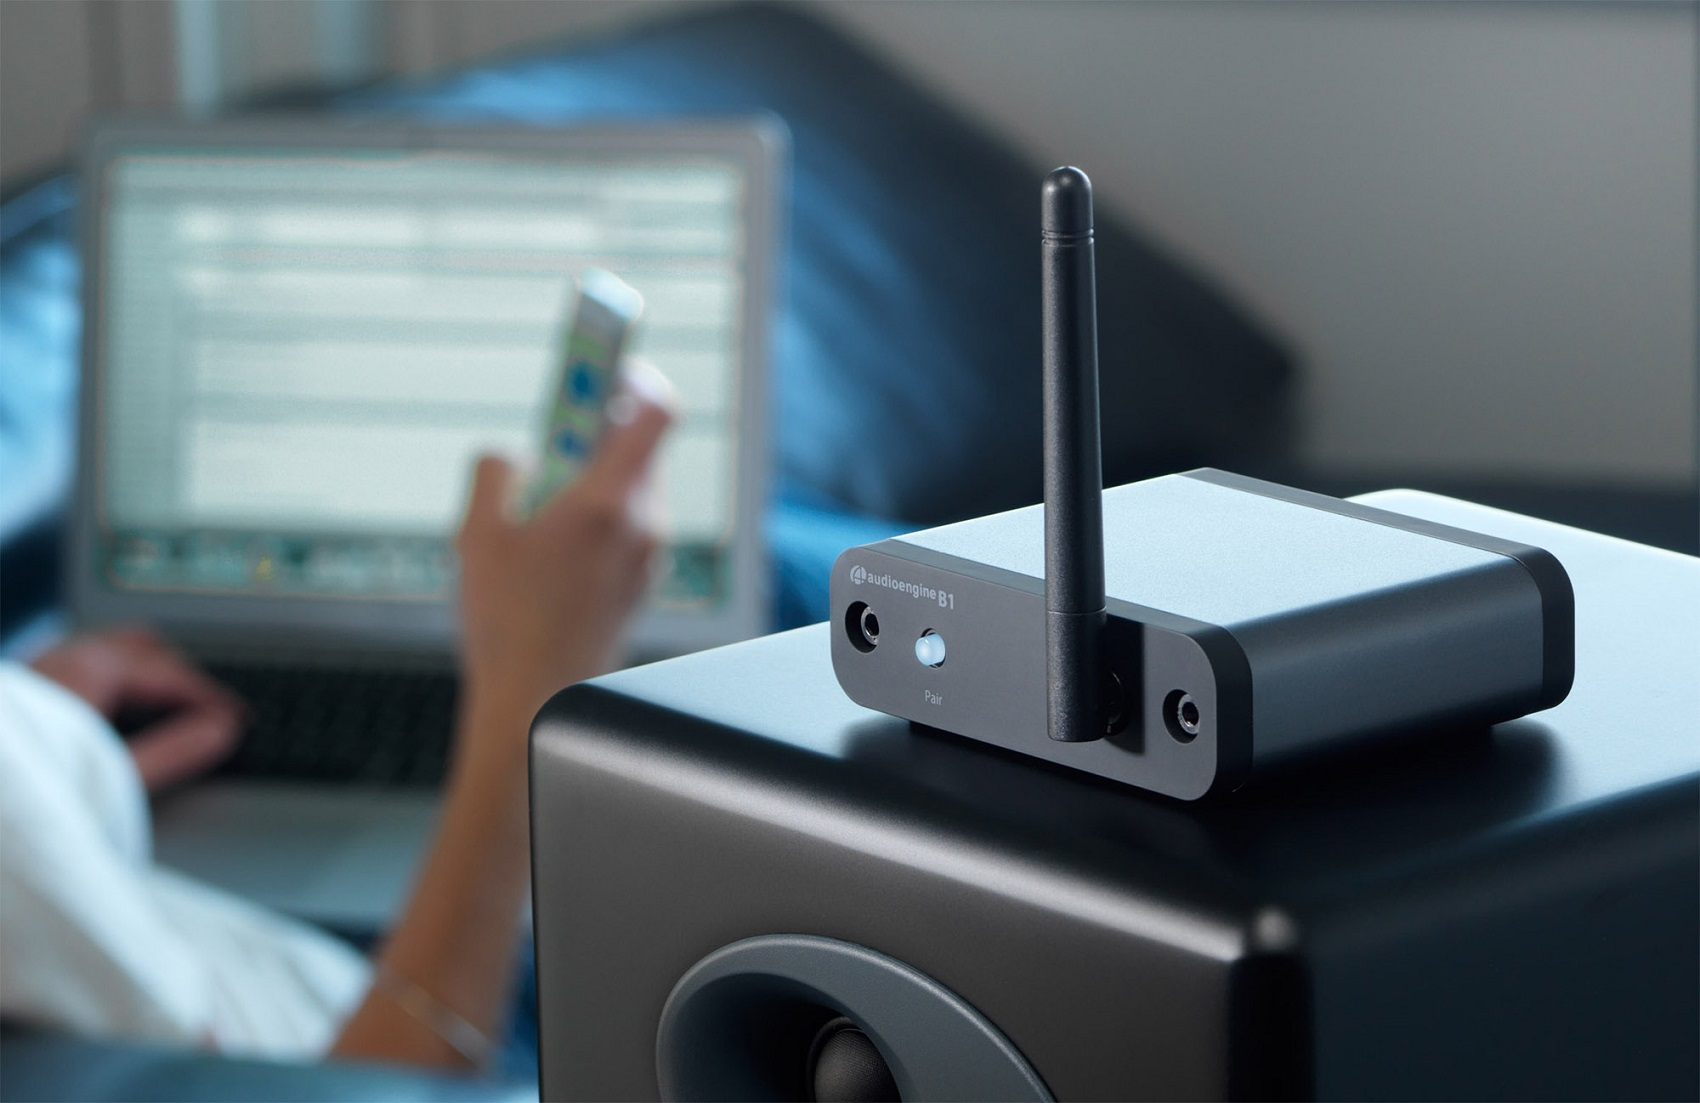 Thiết bị thêm bluetooth cho loa cao cấp AudioEngine B1 Premium Bluetooth Receiver